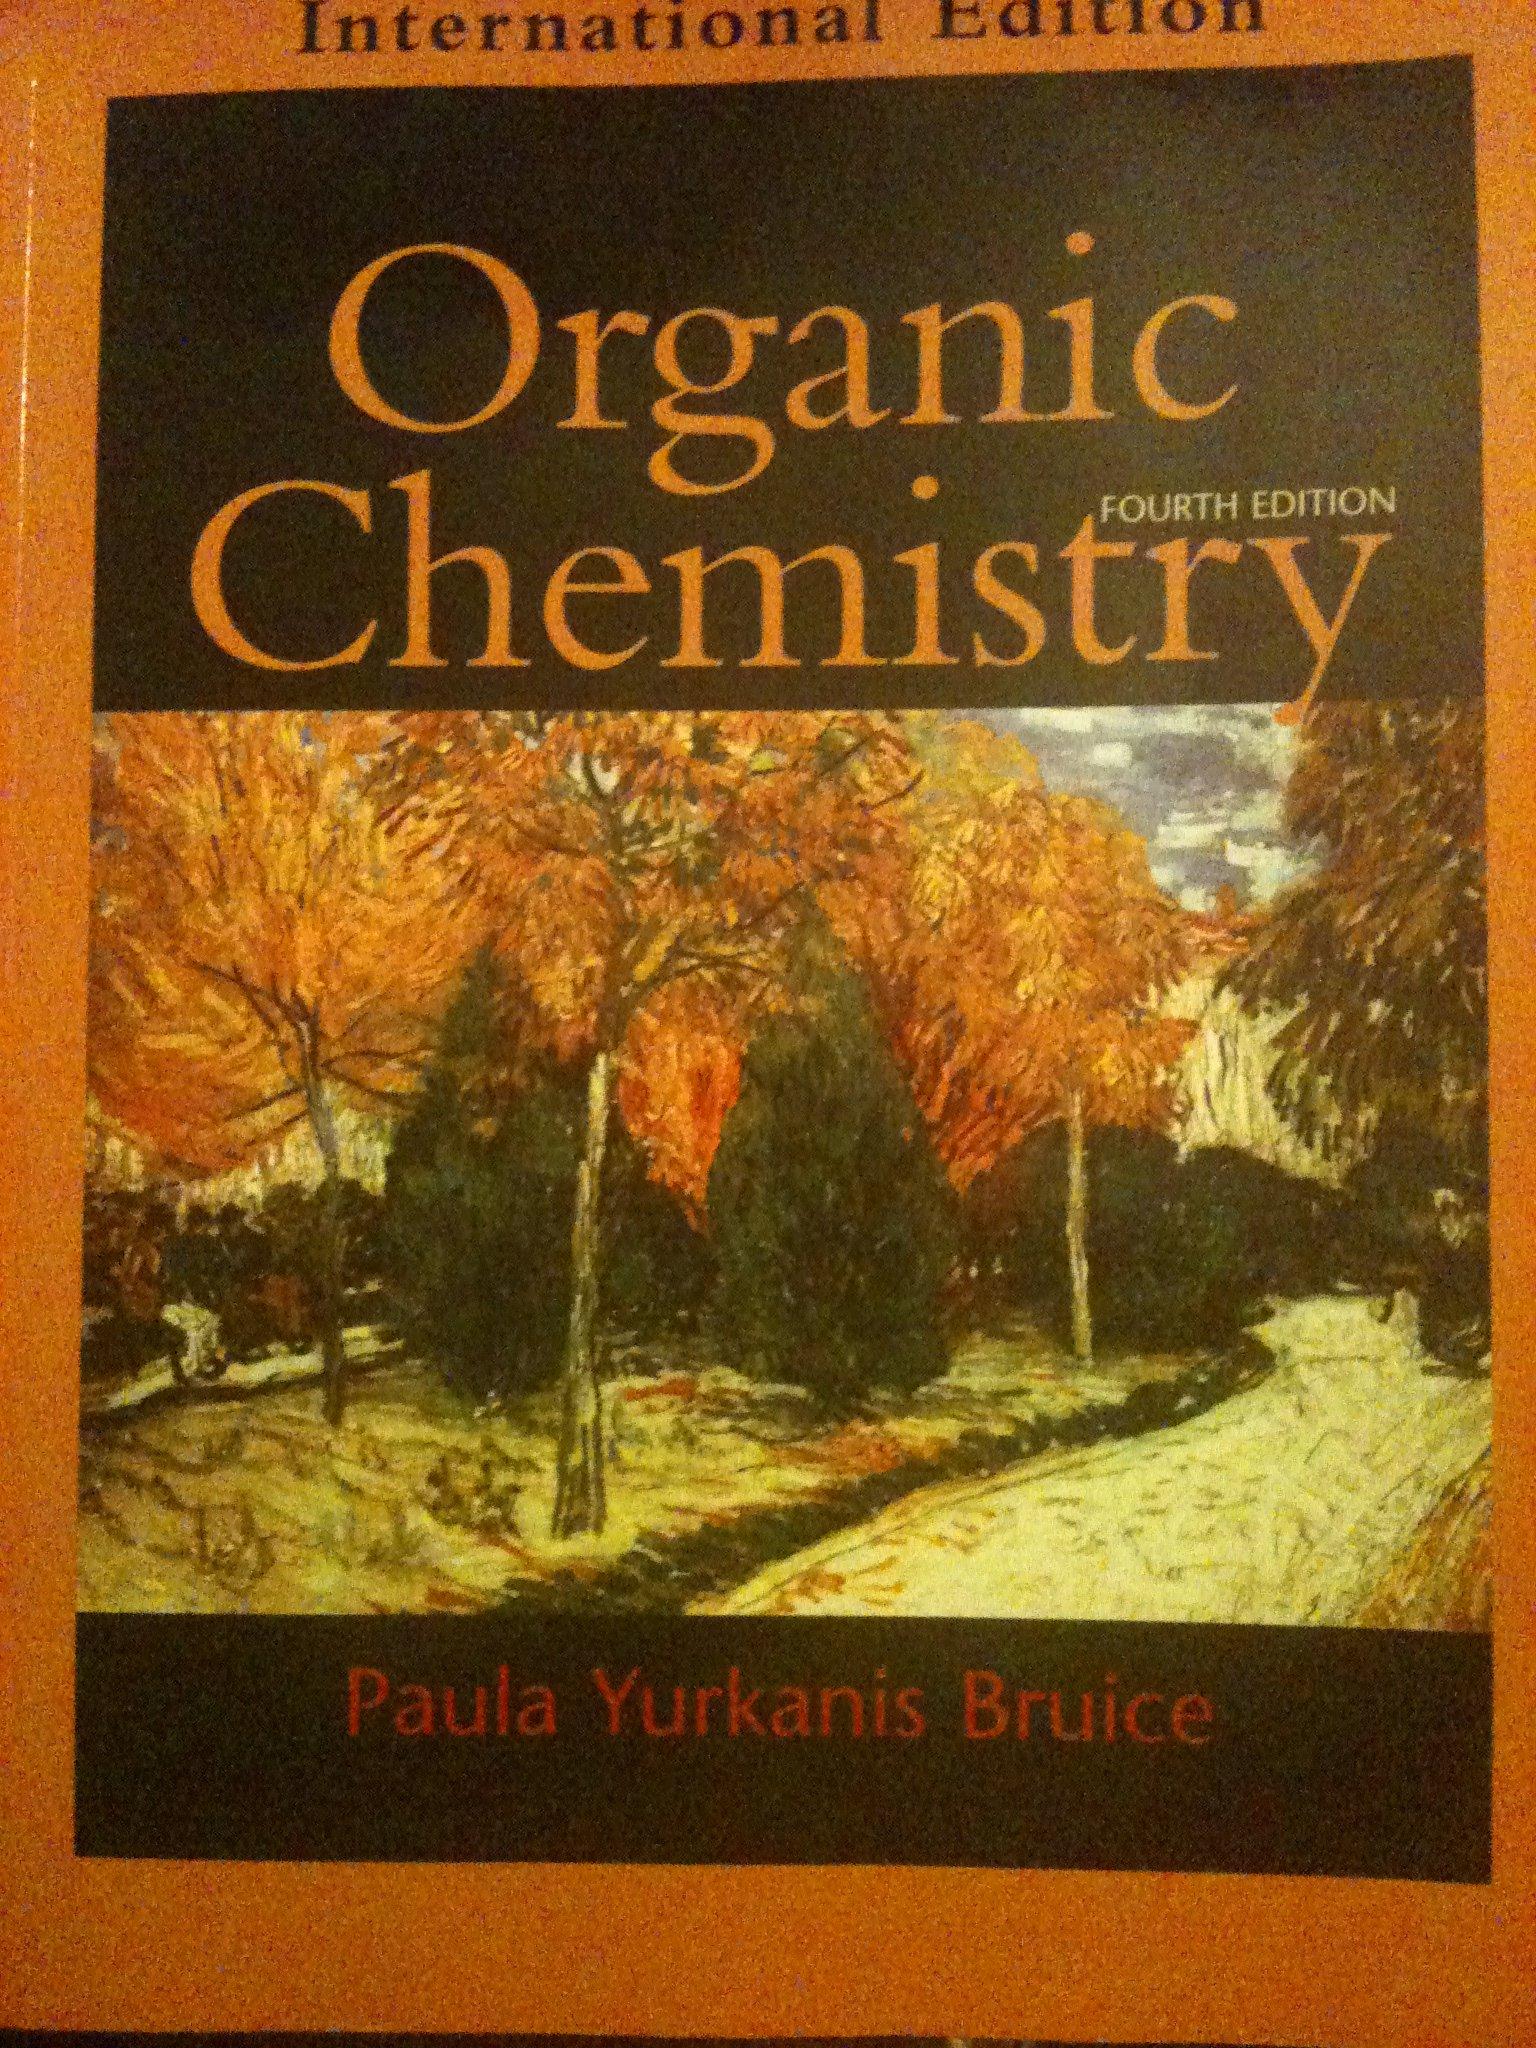 Organic chemistry paula yurkanis bruice, 5th edition | ester | acid.